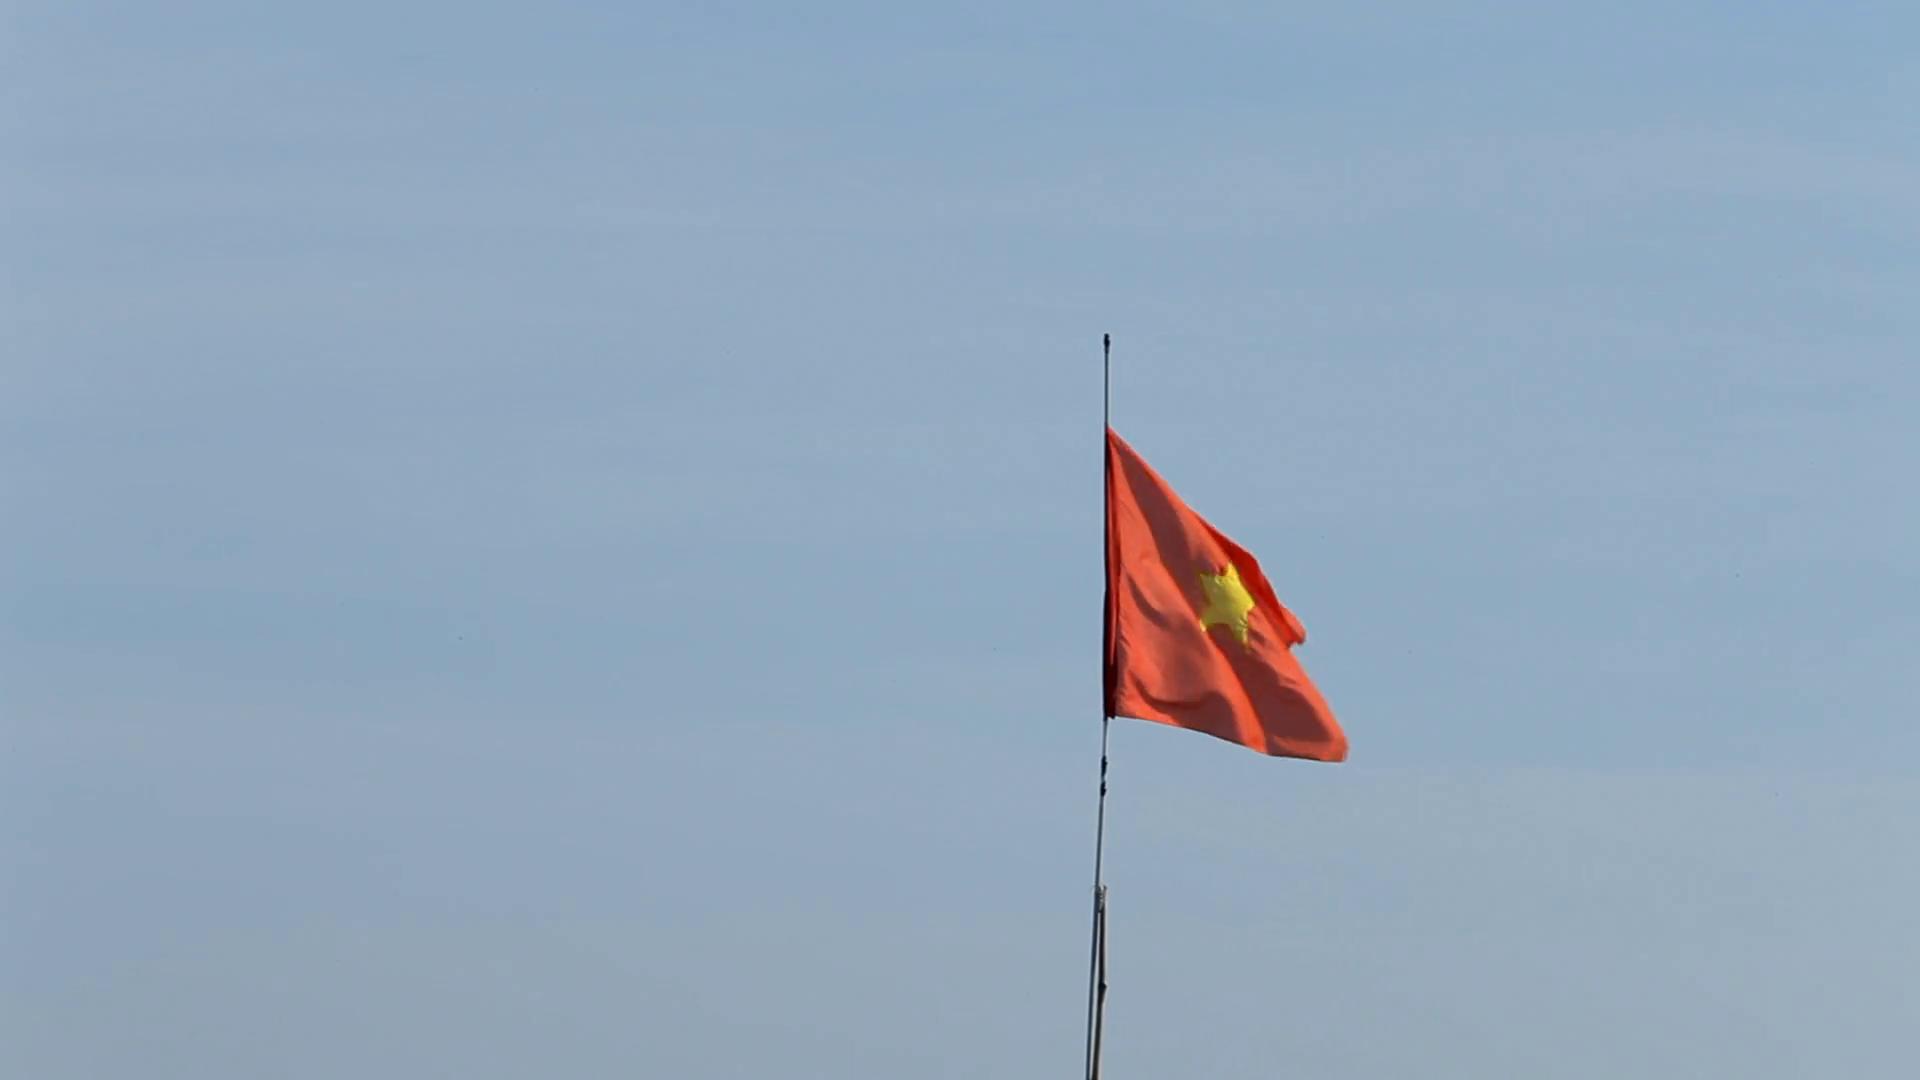 Mh Ld Vietnamese Flag Waving In Wind Vietnam Stock Video Footage Storyblocks